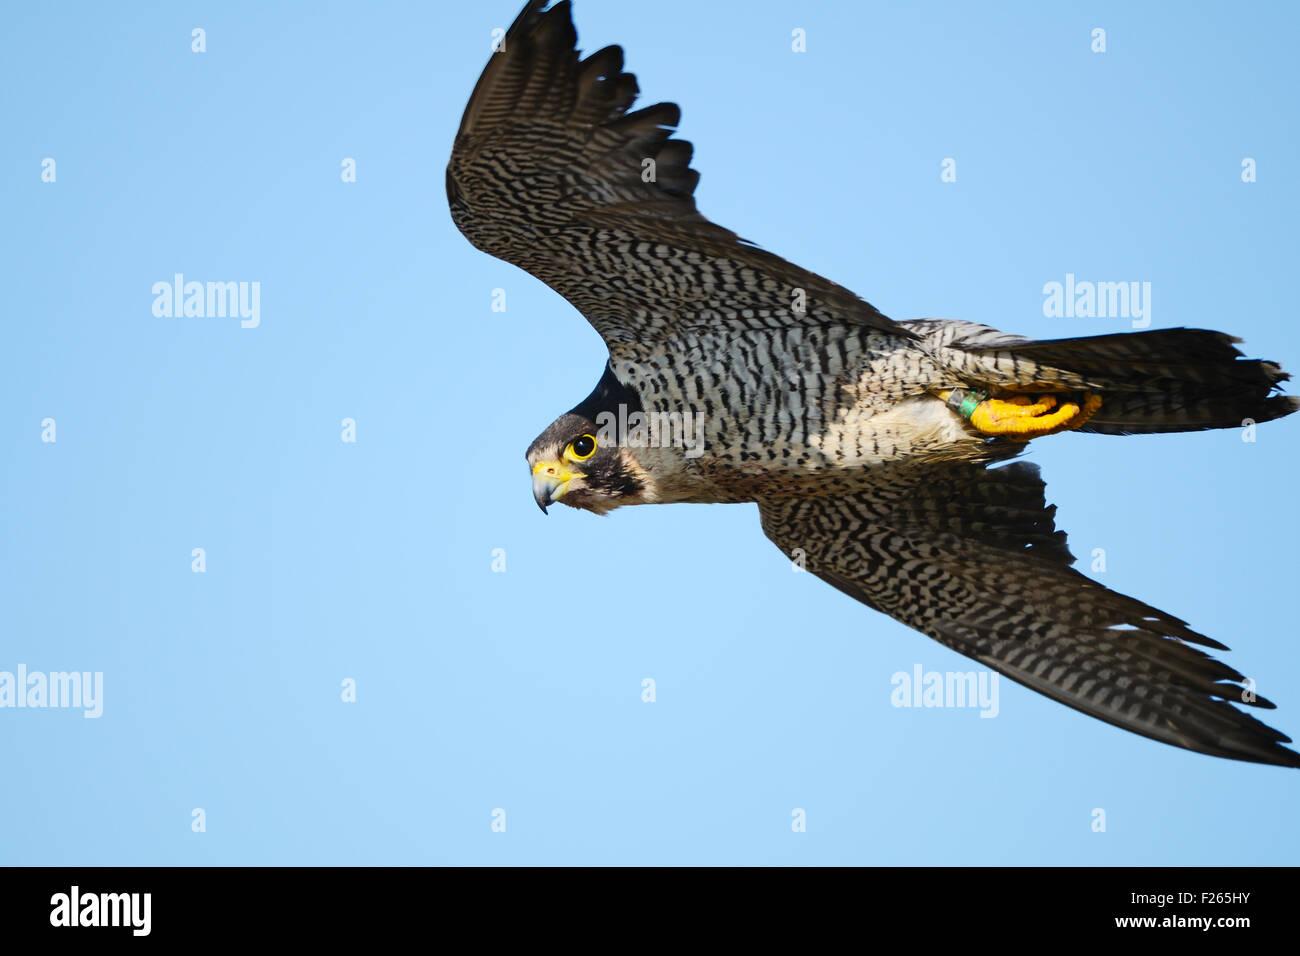 Peregrine Falcon in Flight - Stock Image